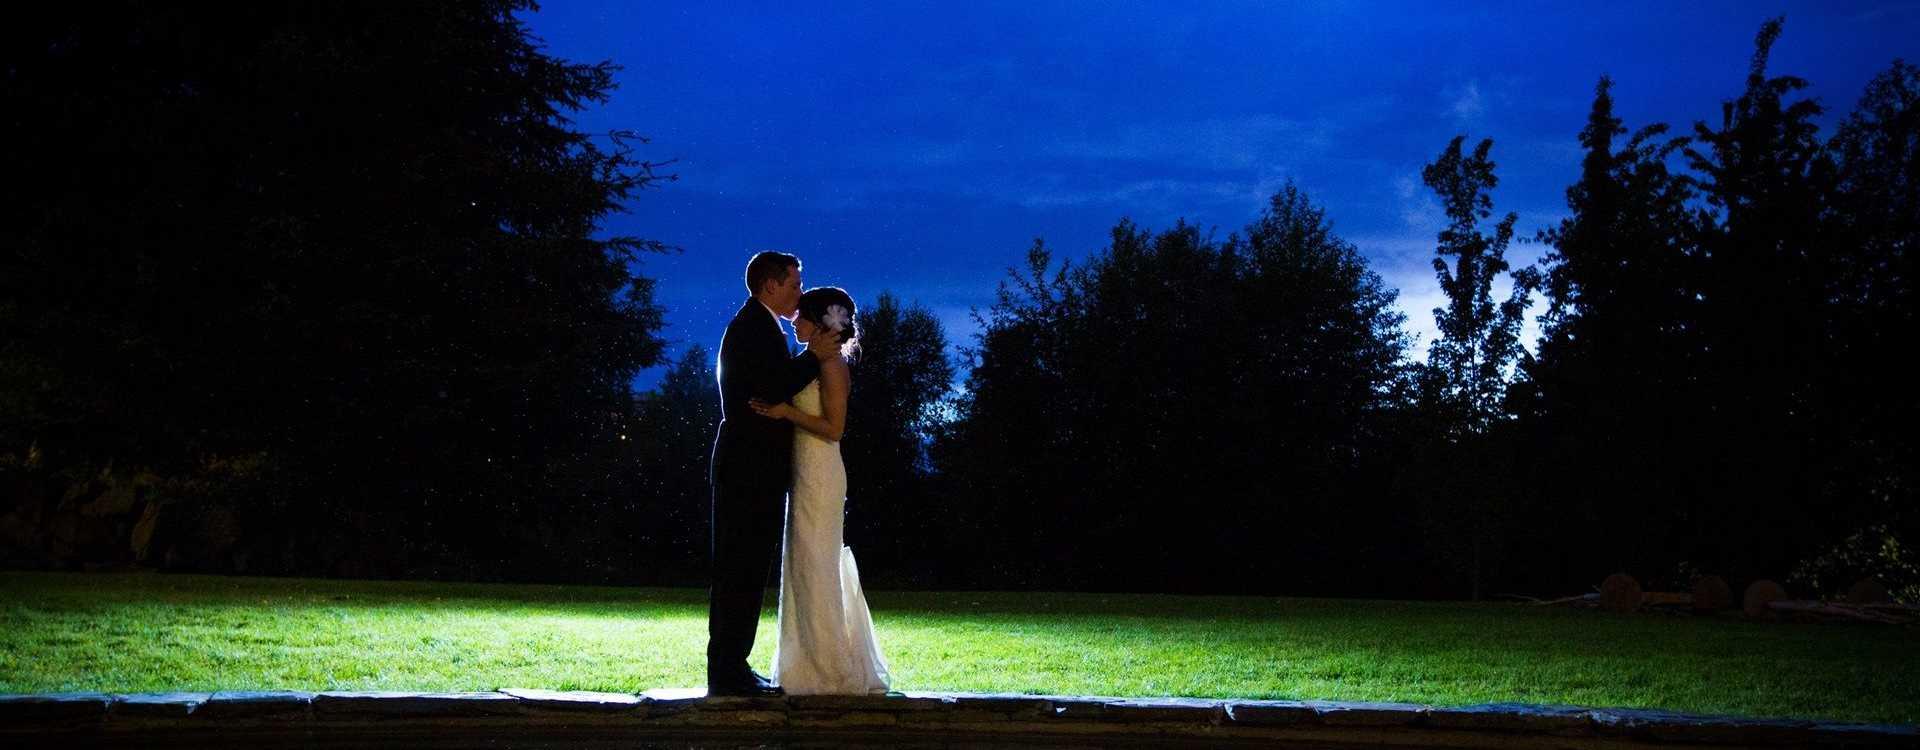 Moonlit Wedding